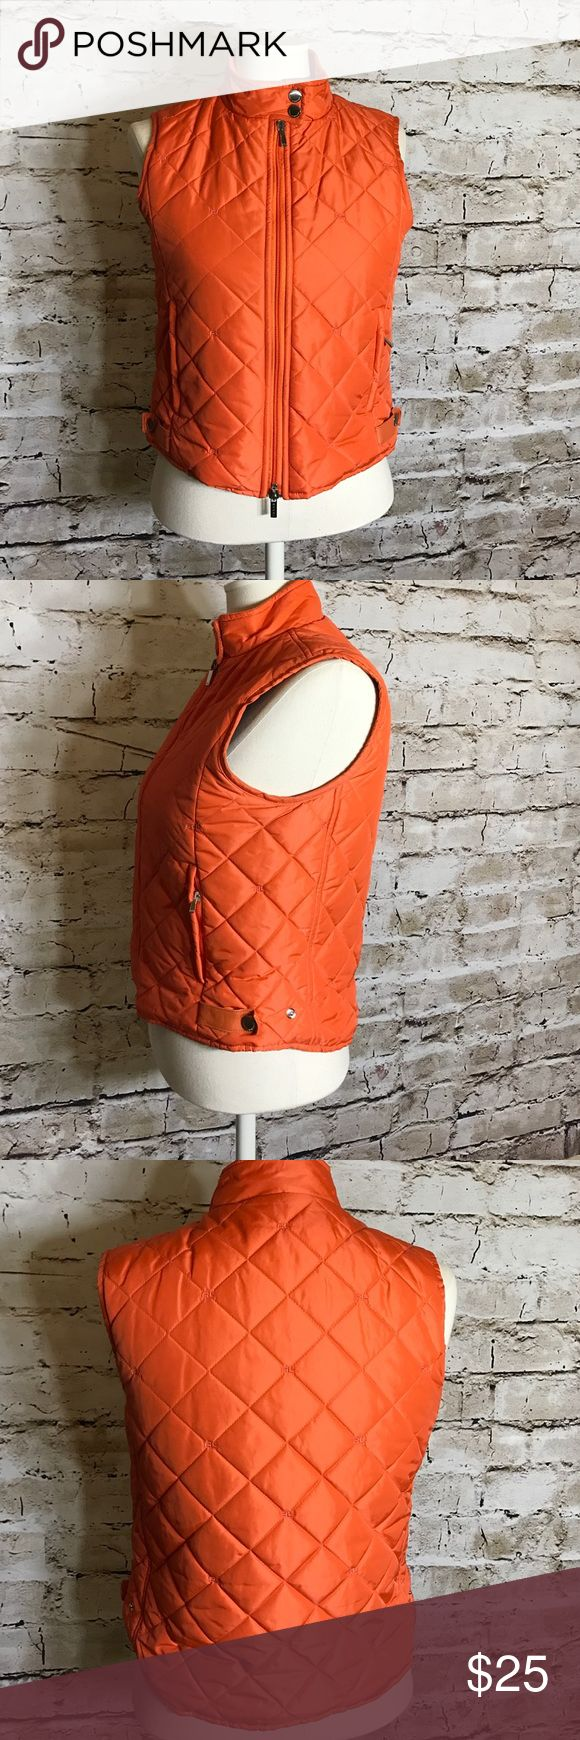 Ralph Lauren quilted vest Orange quilted vest with RL stitched all over Ralph Lauren Jackets & Coats Vests